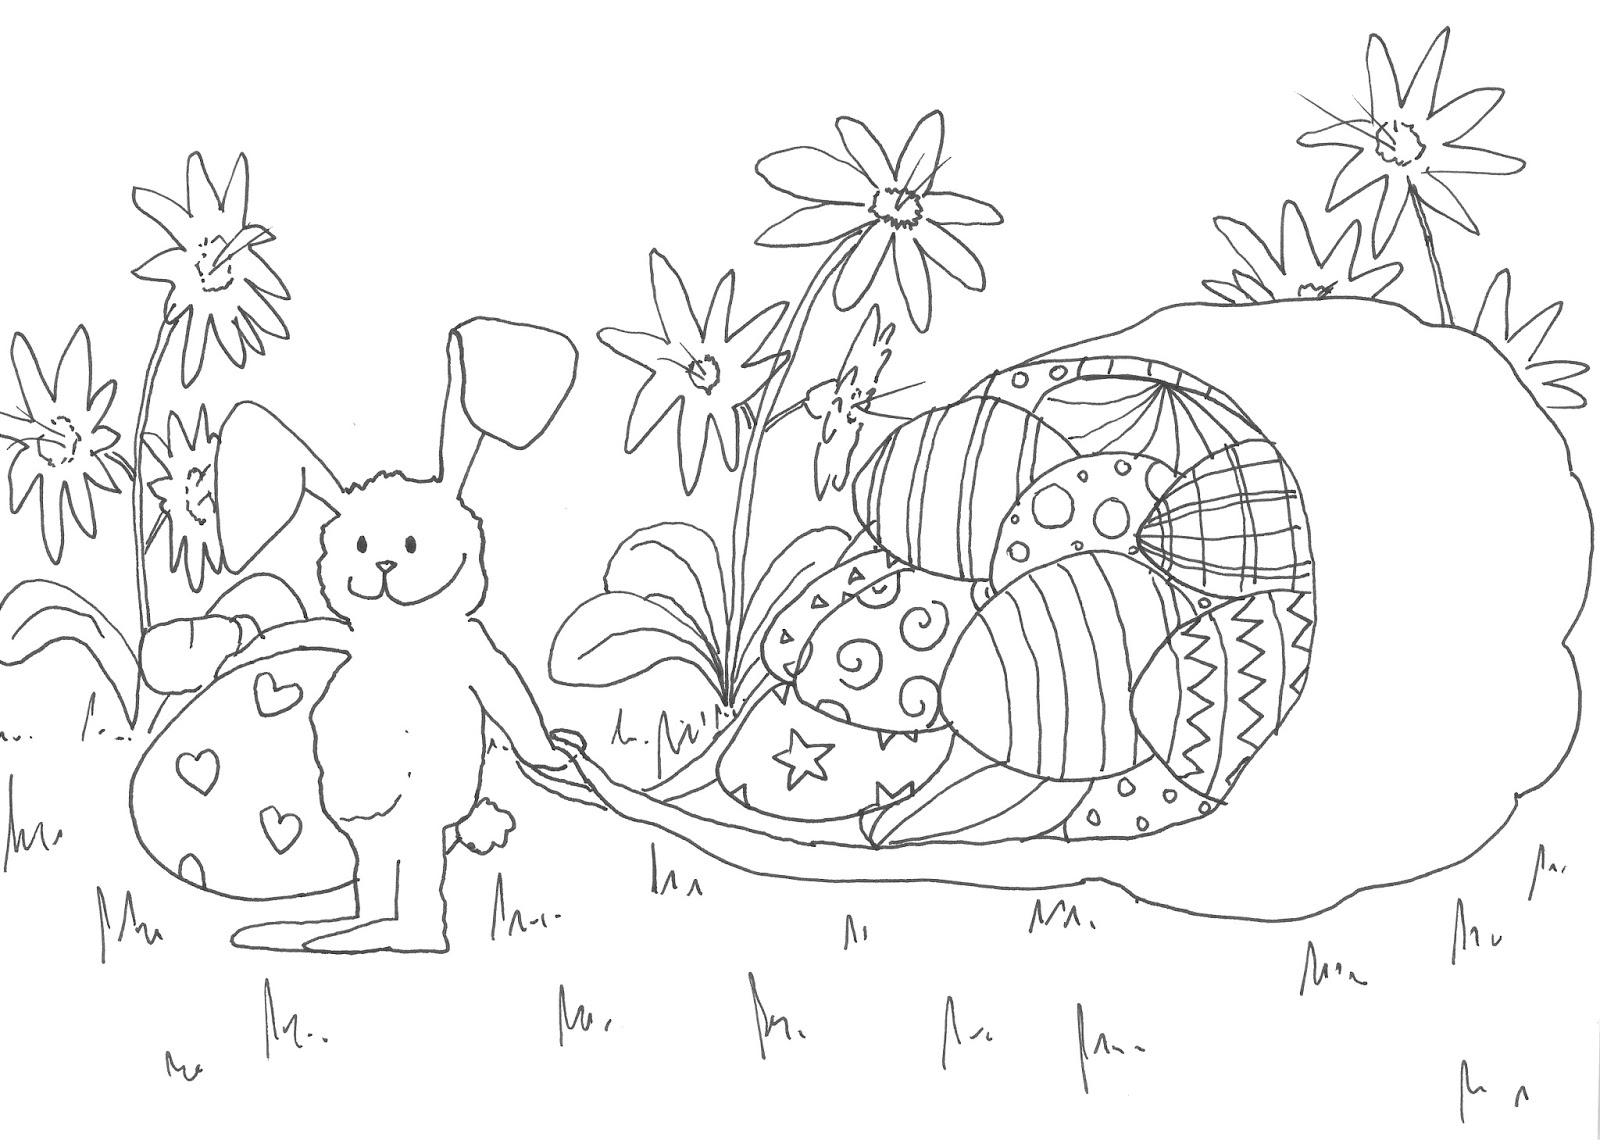 Dibujo para colorear de huevos de Pascua